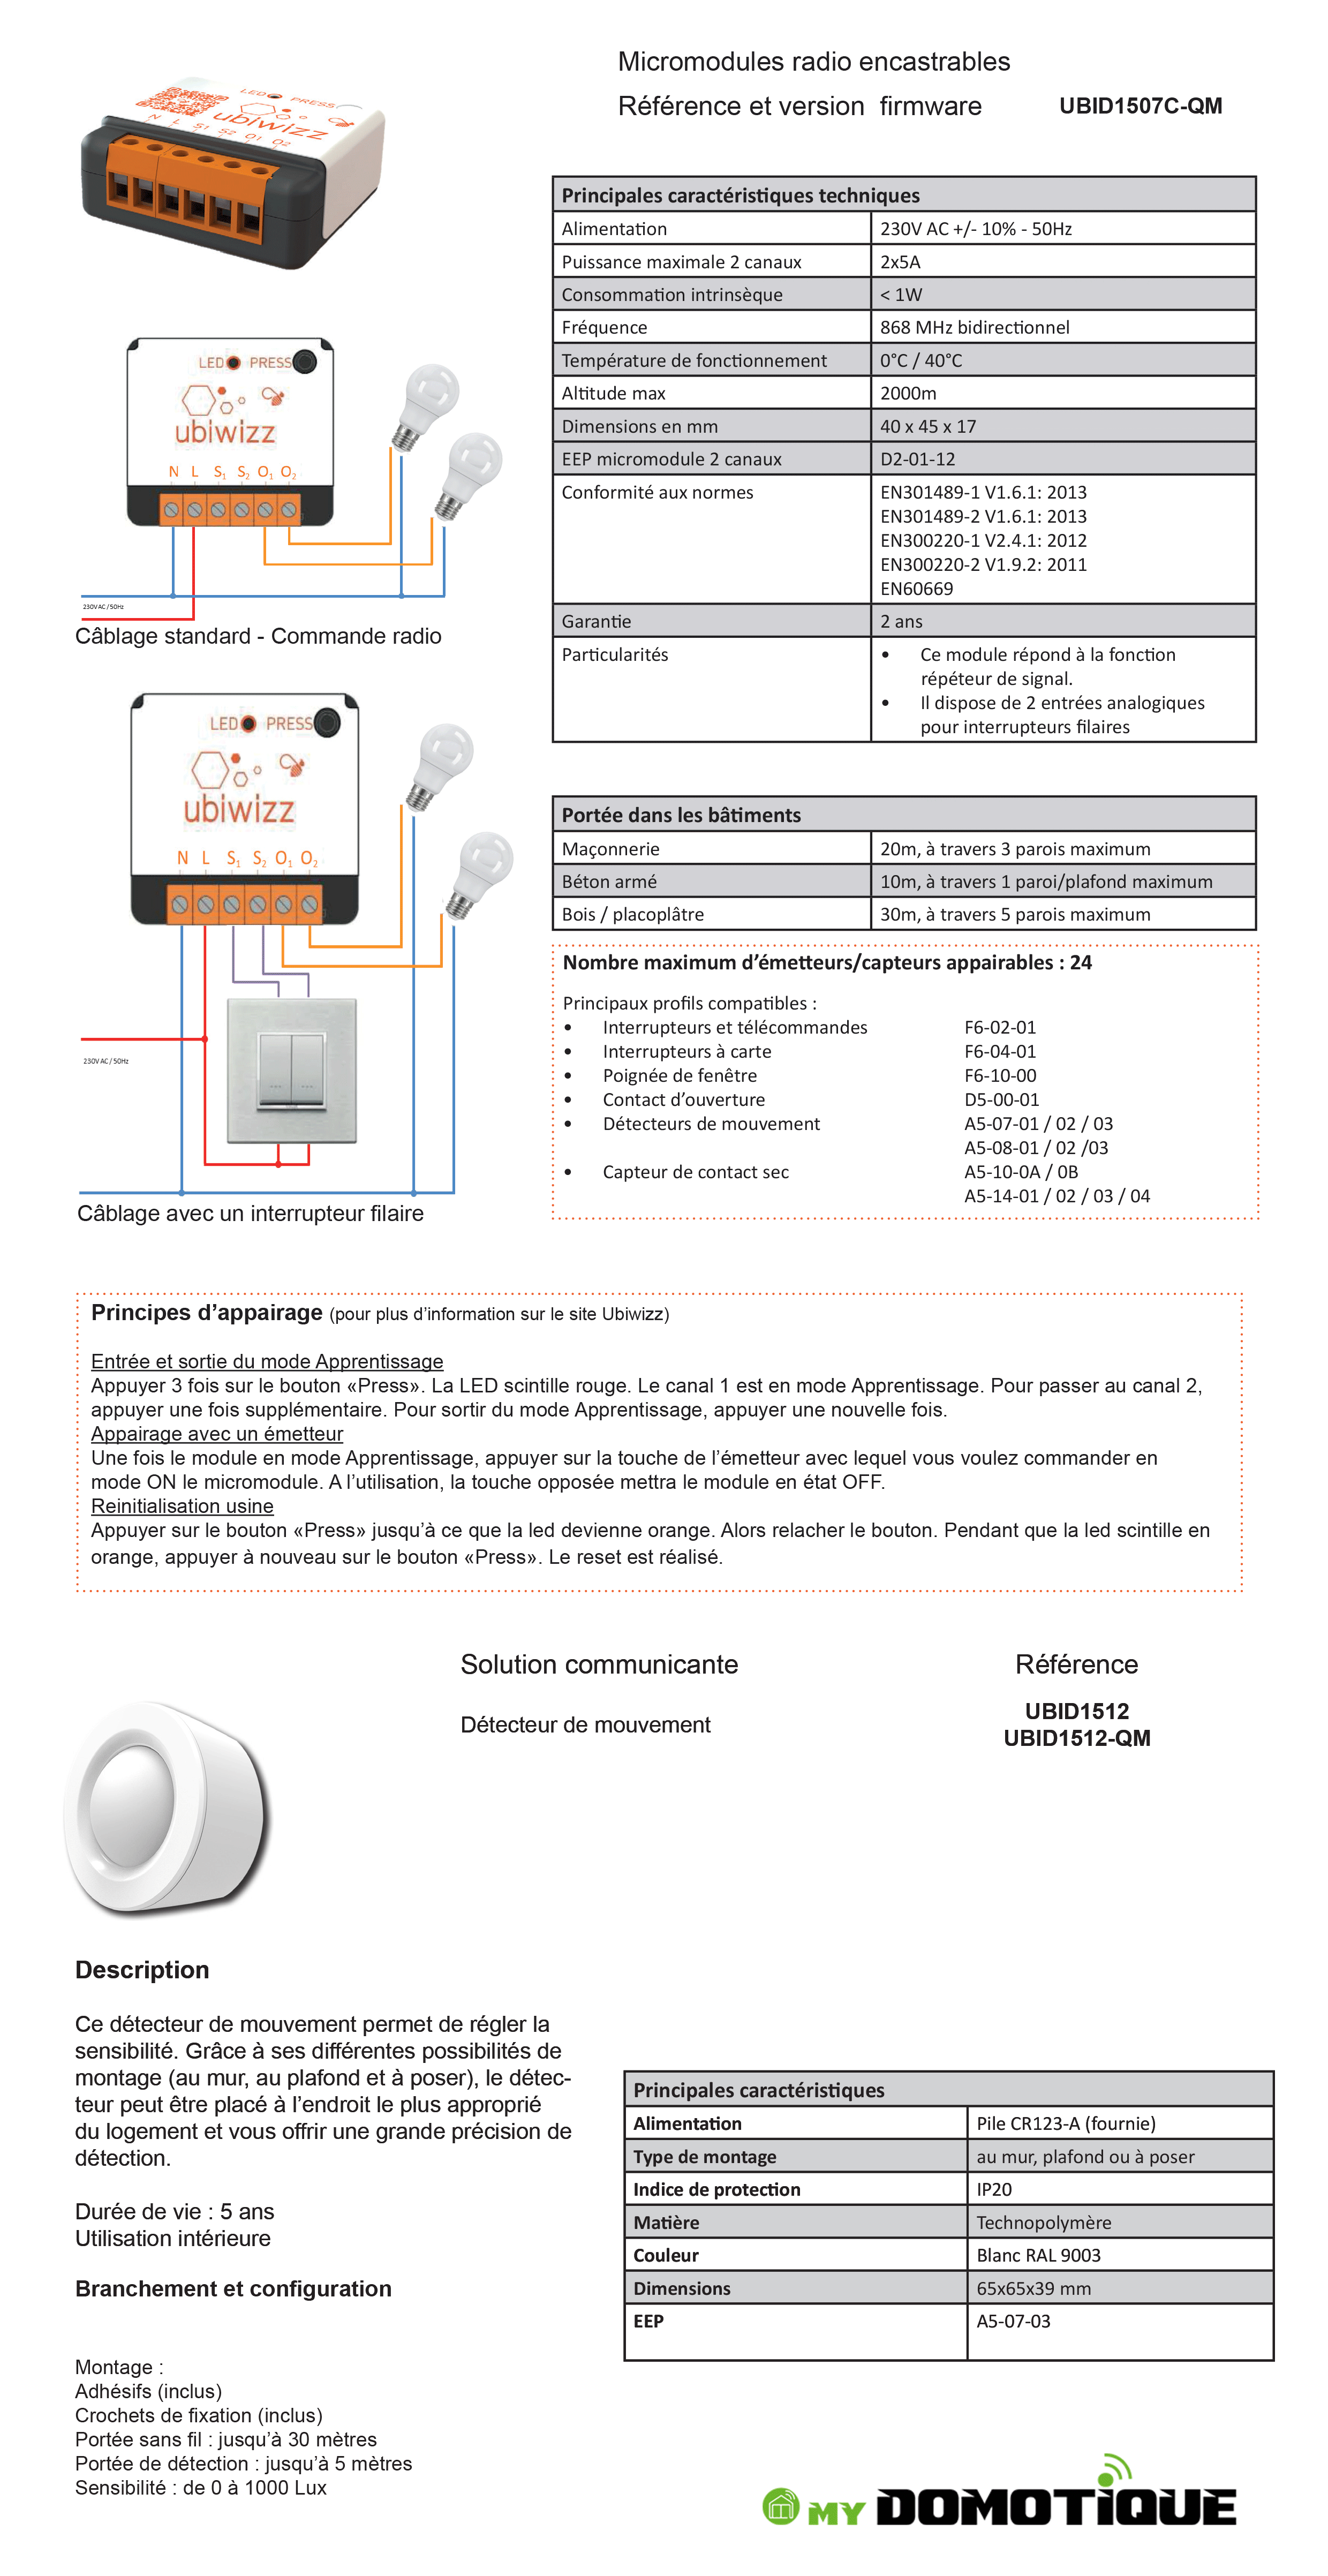 Micromodules%20radio%20encastrables%20UBID1507C-QM%20D%C3%A9tecteur%20de%20mouvement%20Ubiwizz%20UBID1512%20UBID1512-QM.png